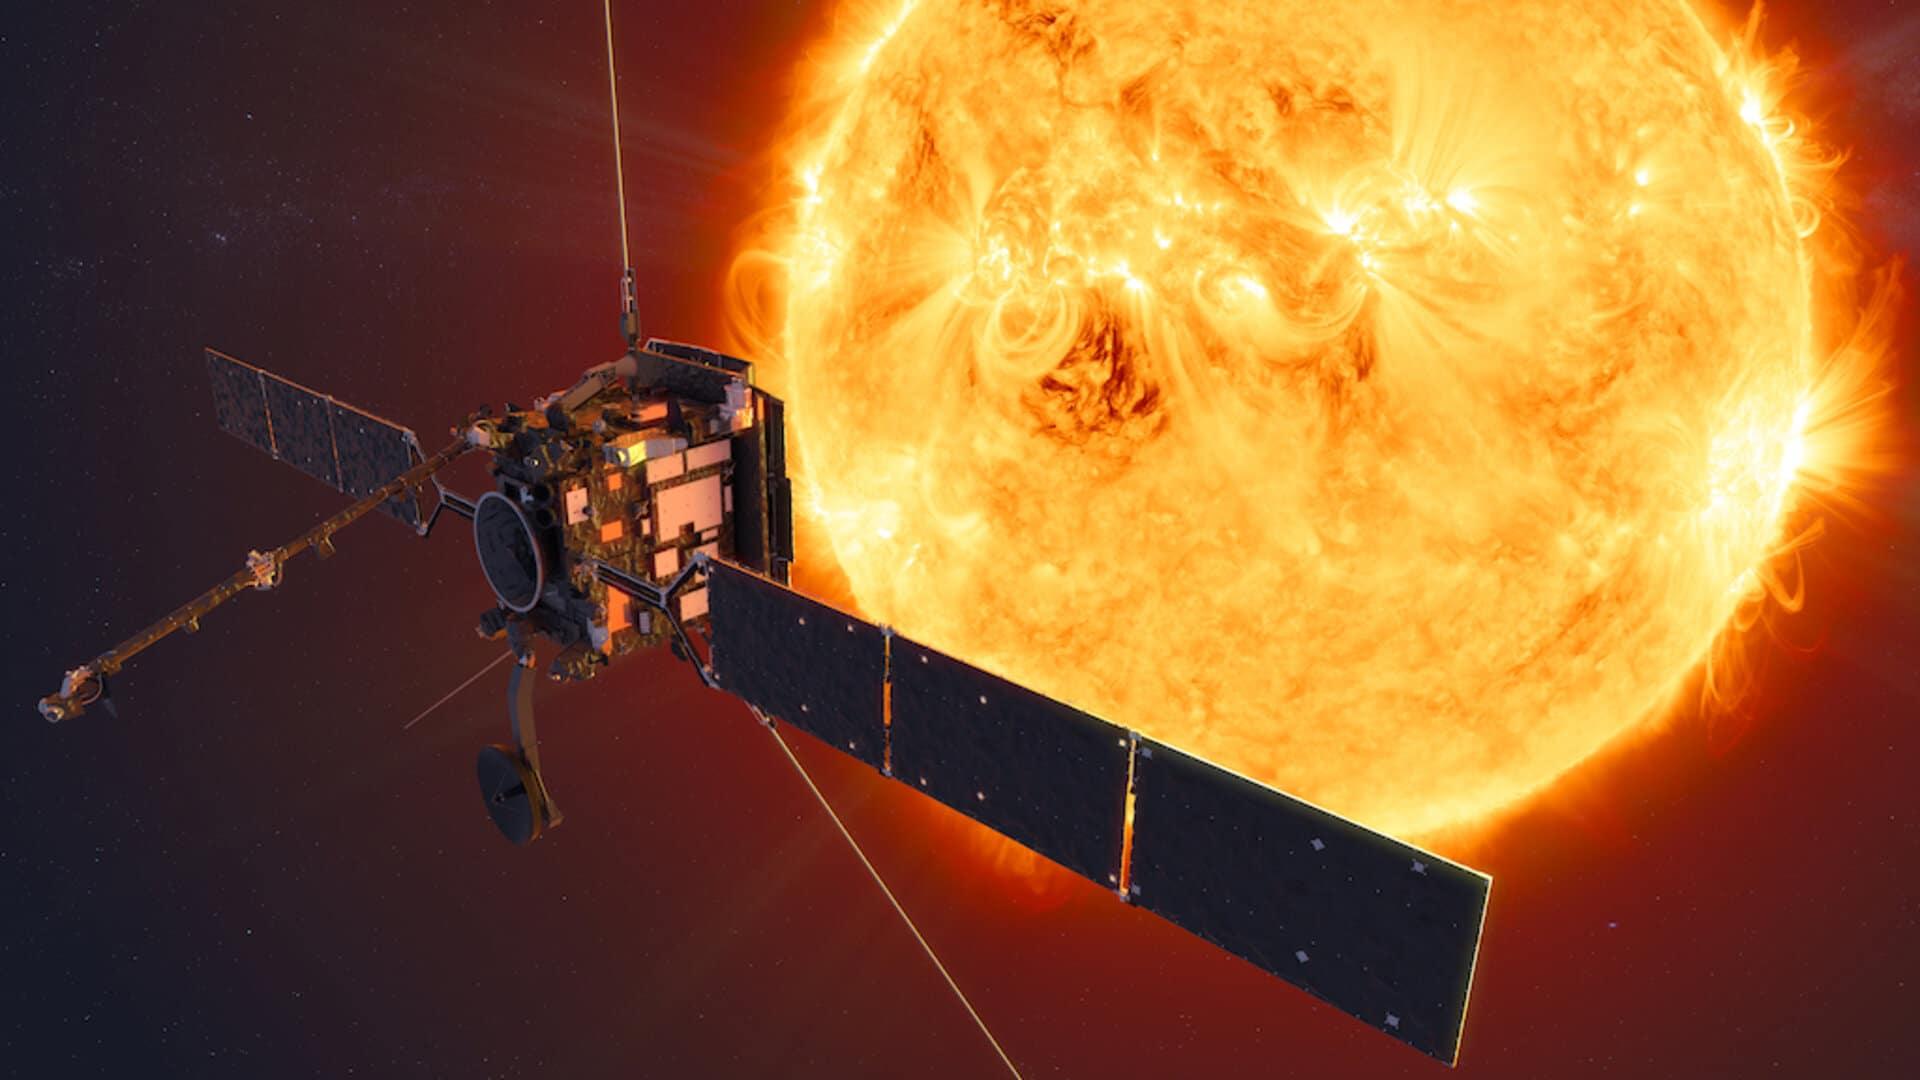 solar orbiter urszonda naprendszer